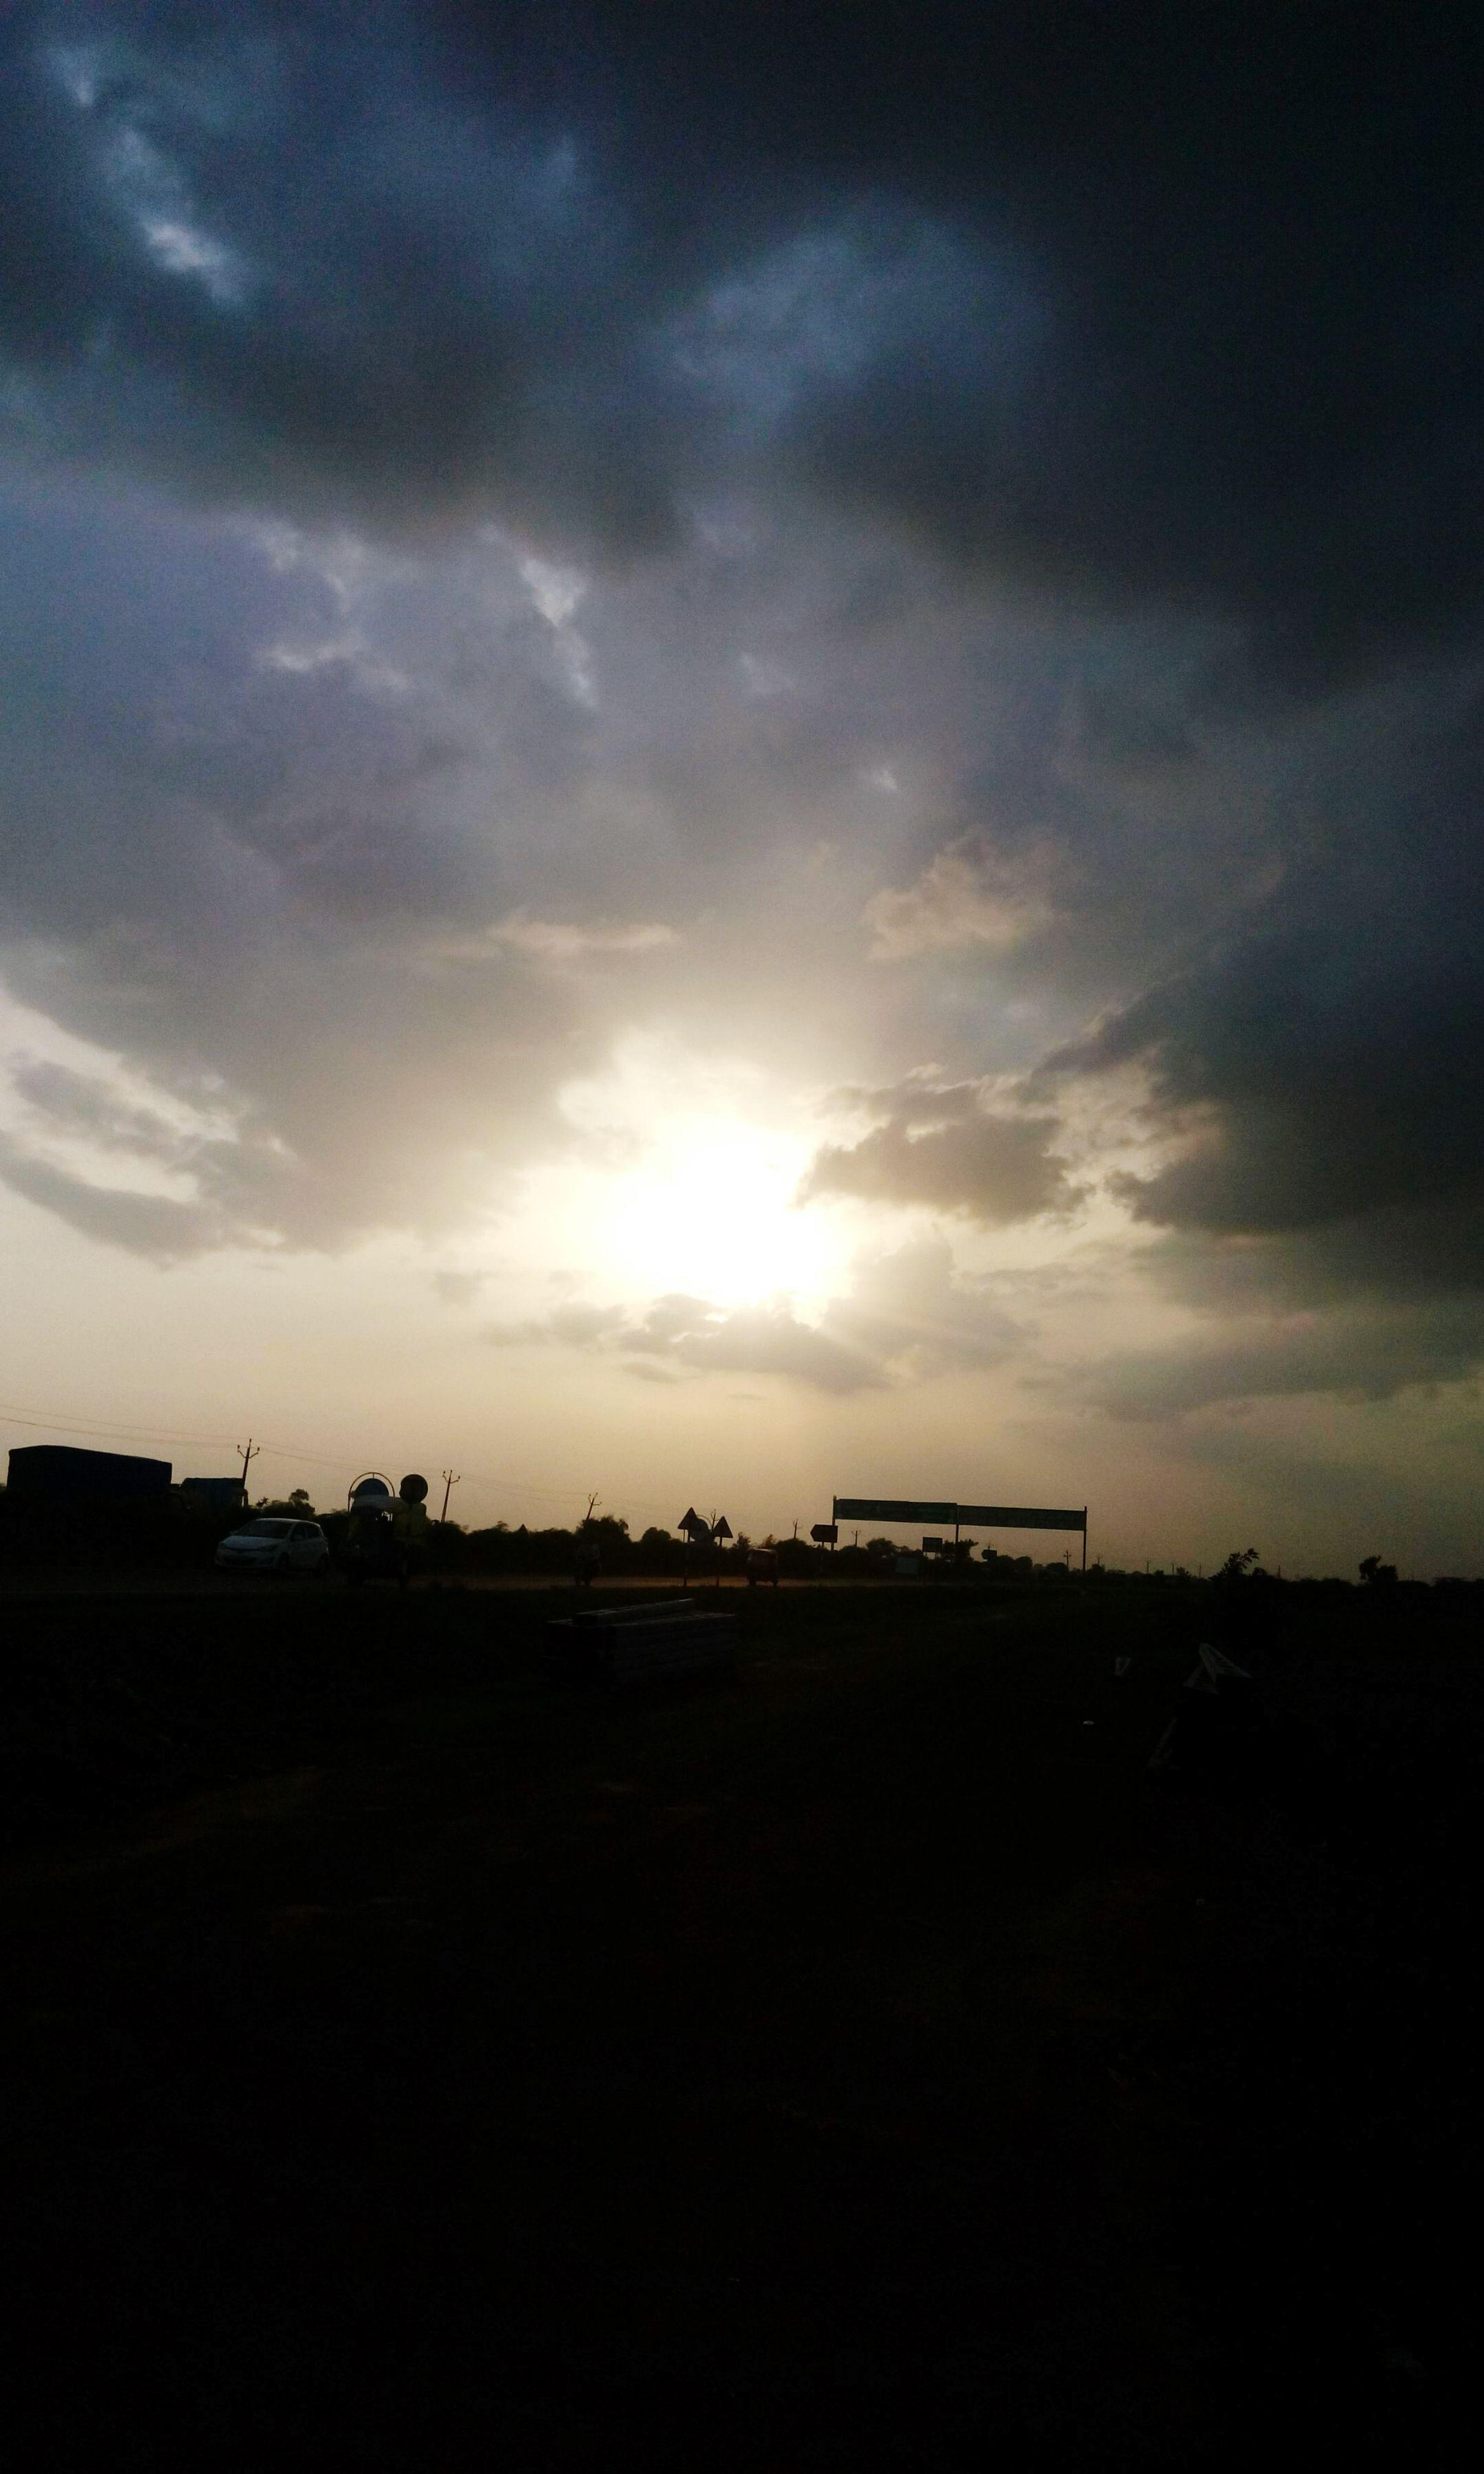 sky, sunset, cloud - sky, silhouette, sun, cloudy, scenics, tranquility, tranquil scene, beauty in nature, nature, cloud, sunlight, sunbeam, transportation, outdoors, idyllic, sea, weather, landscape